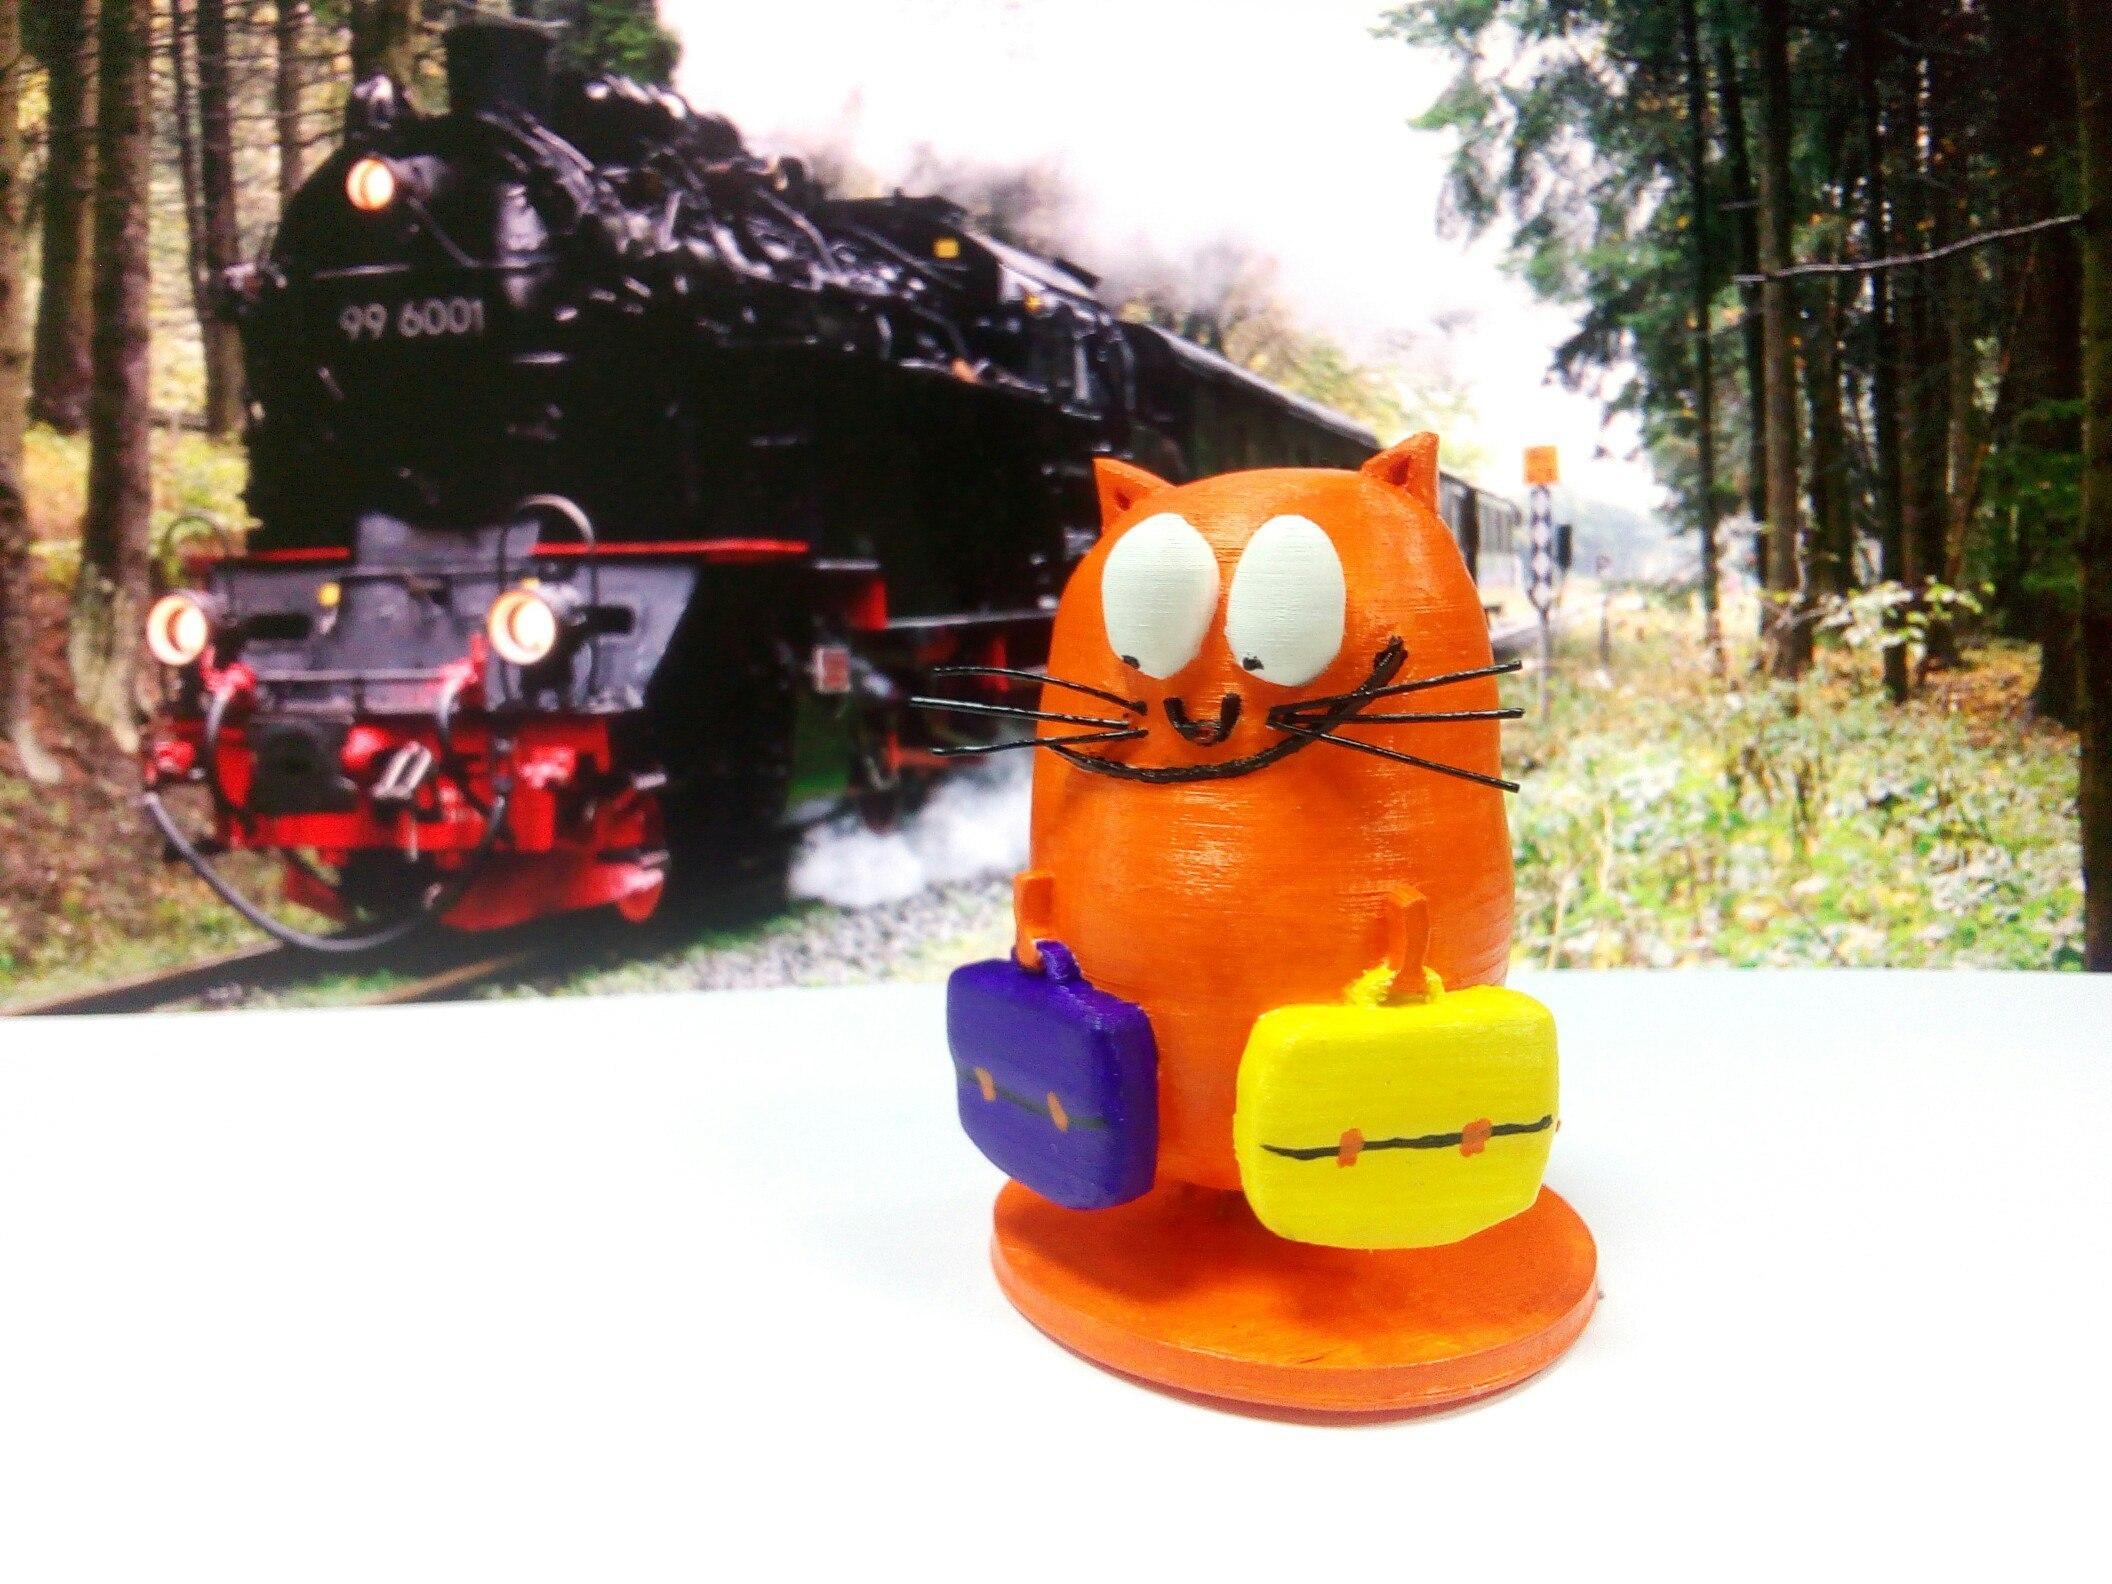 HbGWHy9w8h8.jpg Download STL file Cat with bags • 3D printer model, MaDdIaBlO